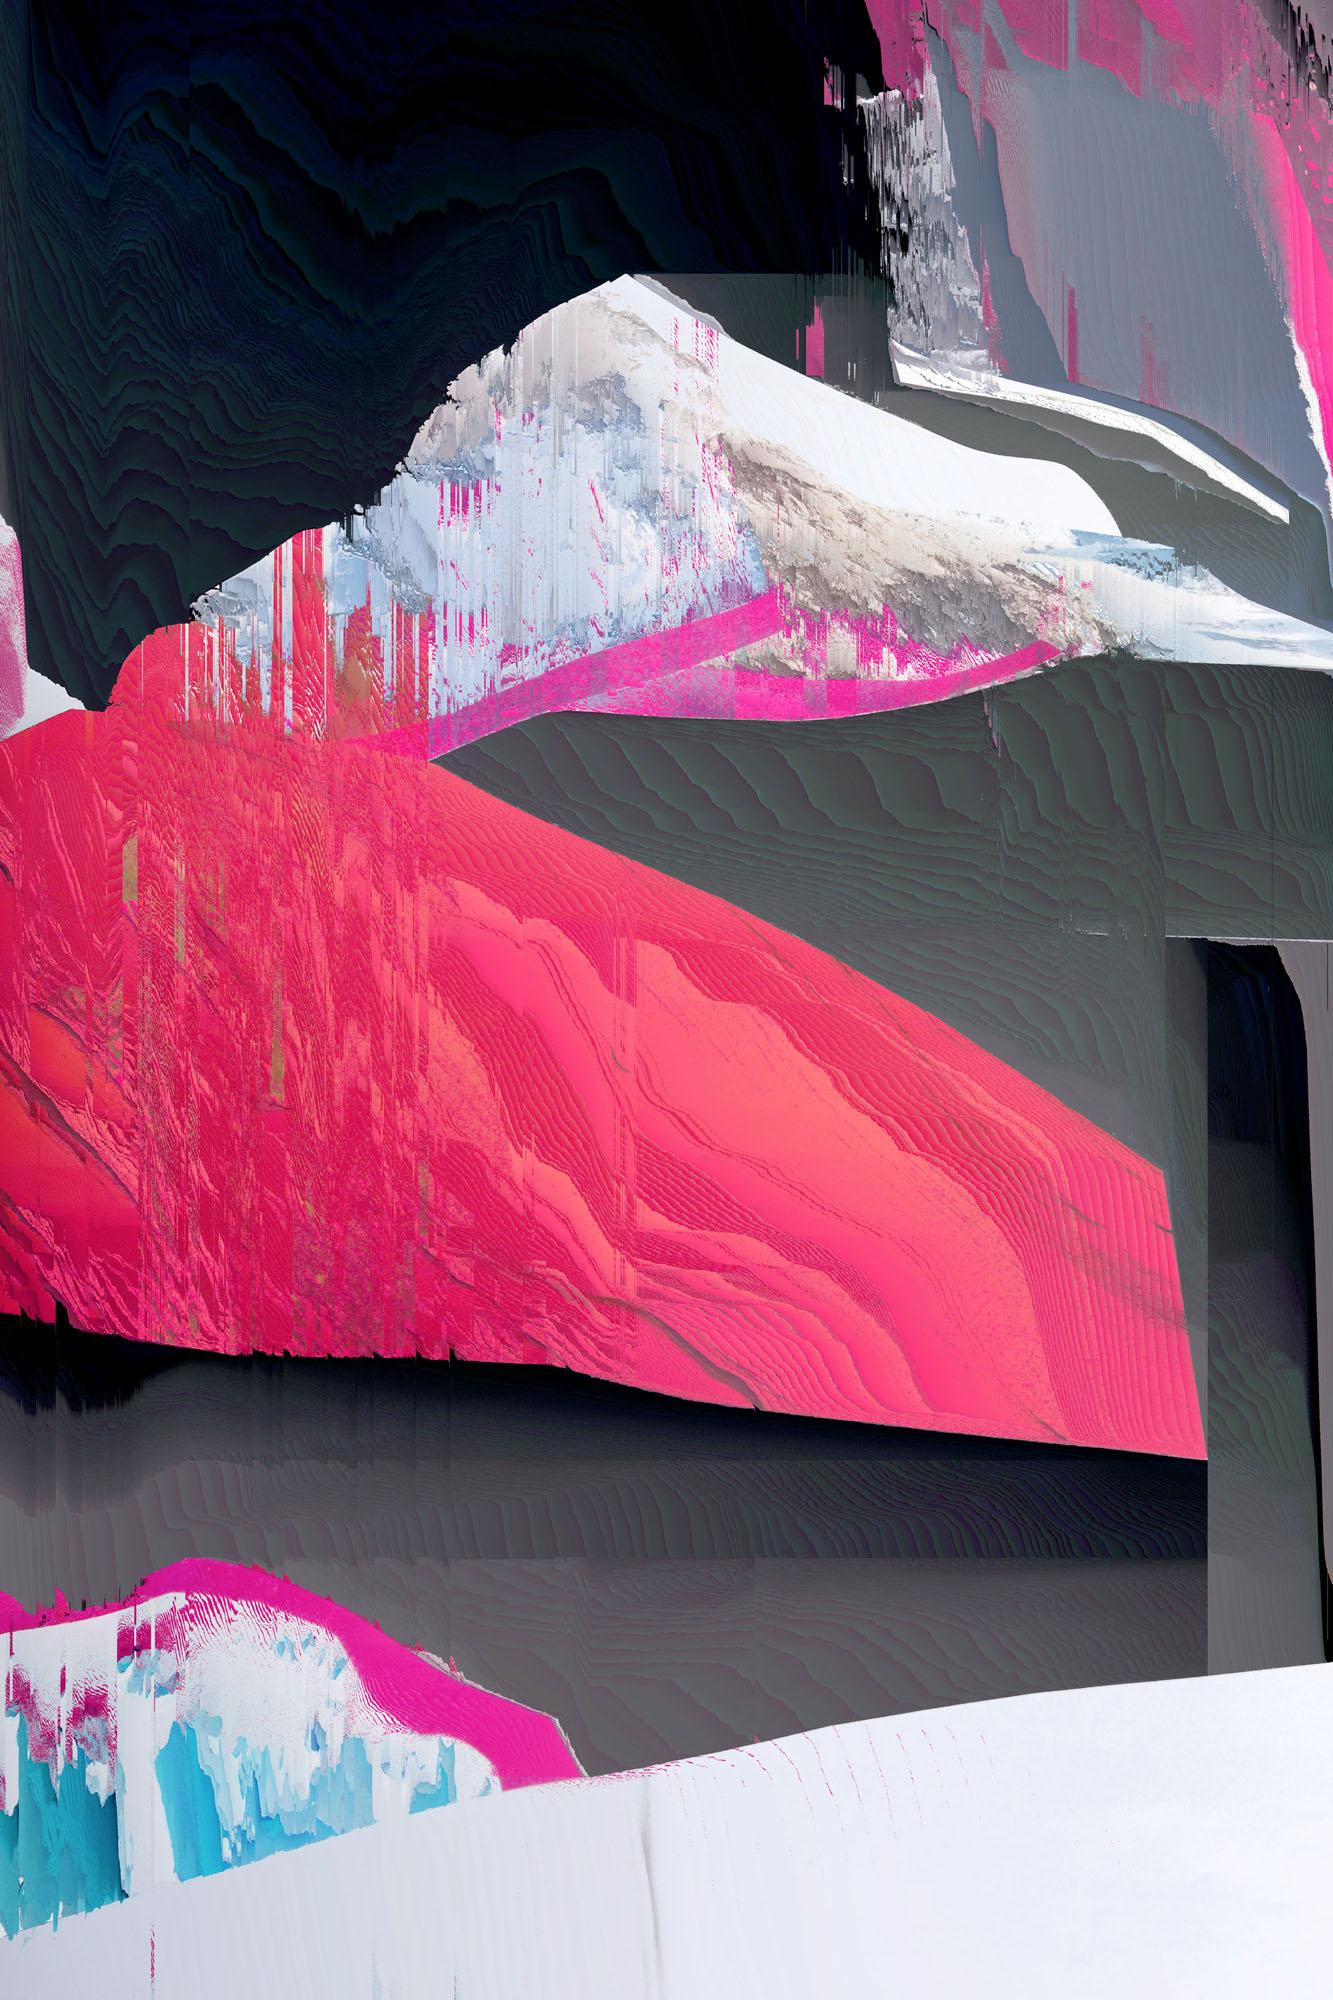 Ewa Doroszenko – Generated Island 21, cyfrowe malarstwo